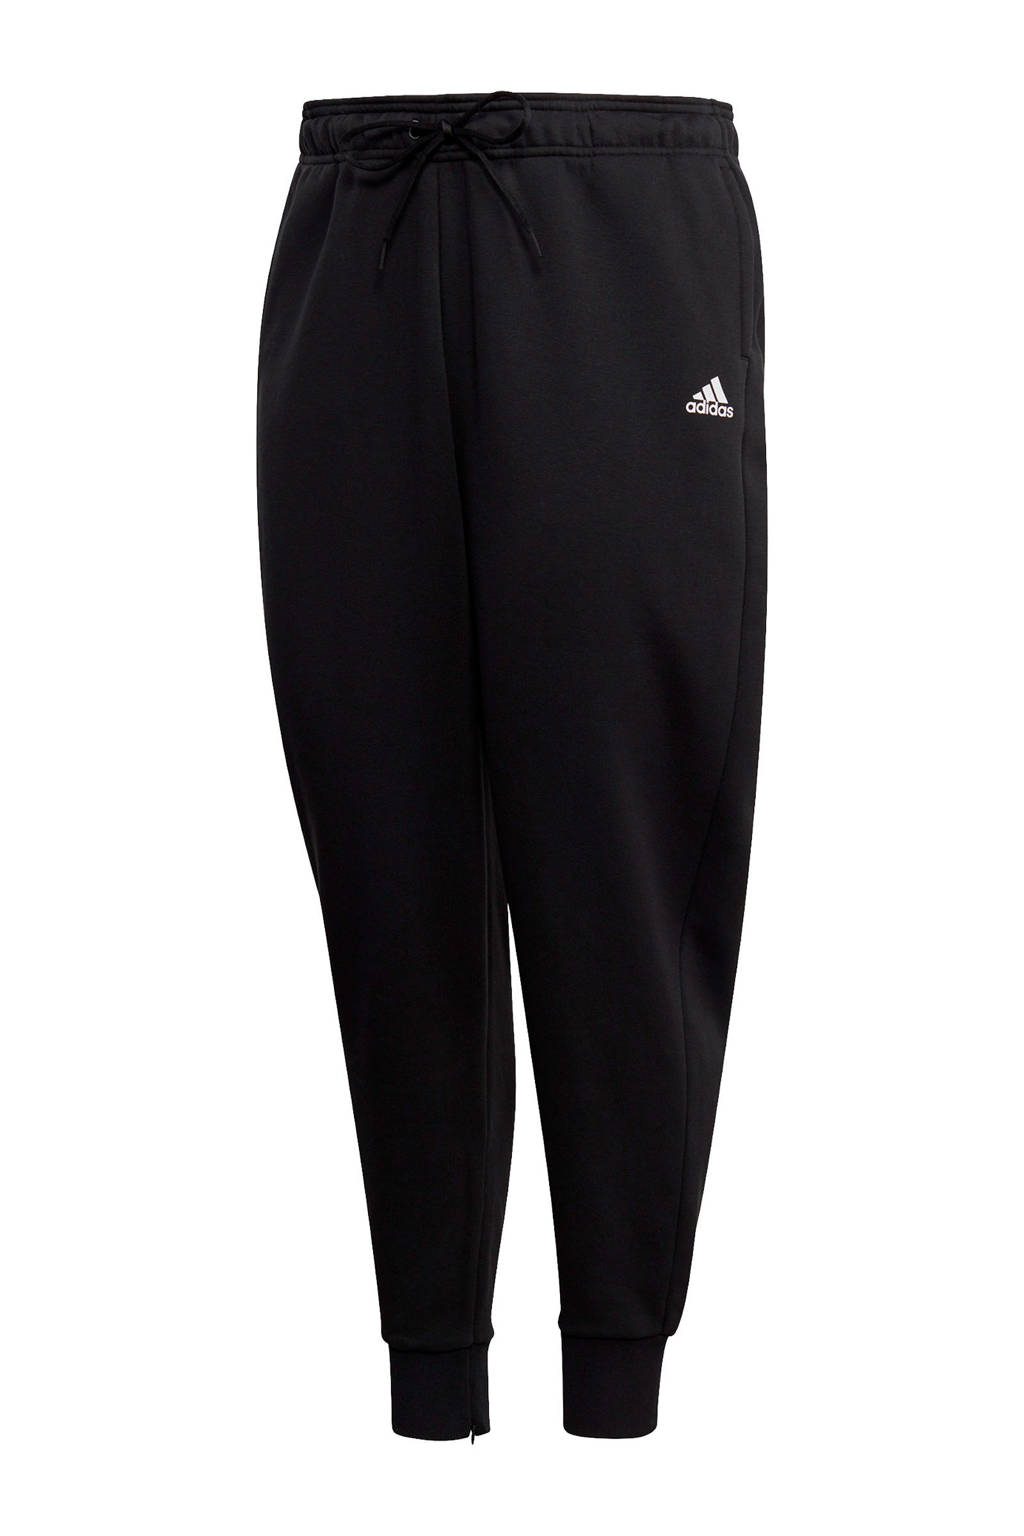 adidas Performance sportbroek zwart, Zwart